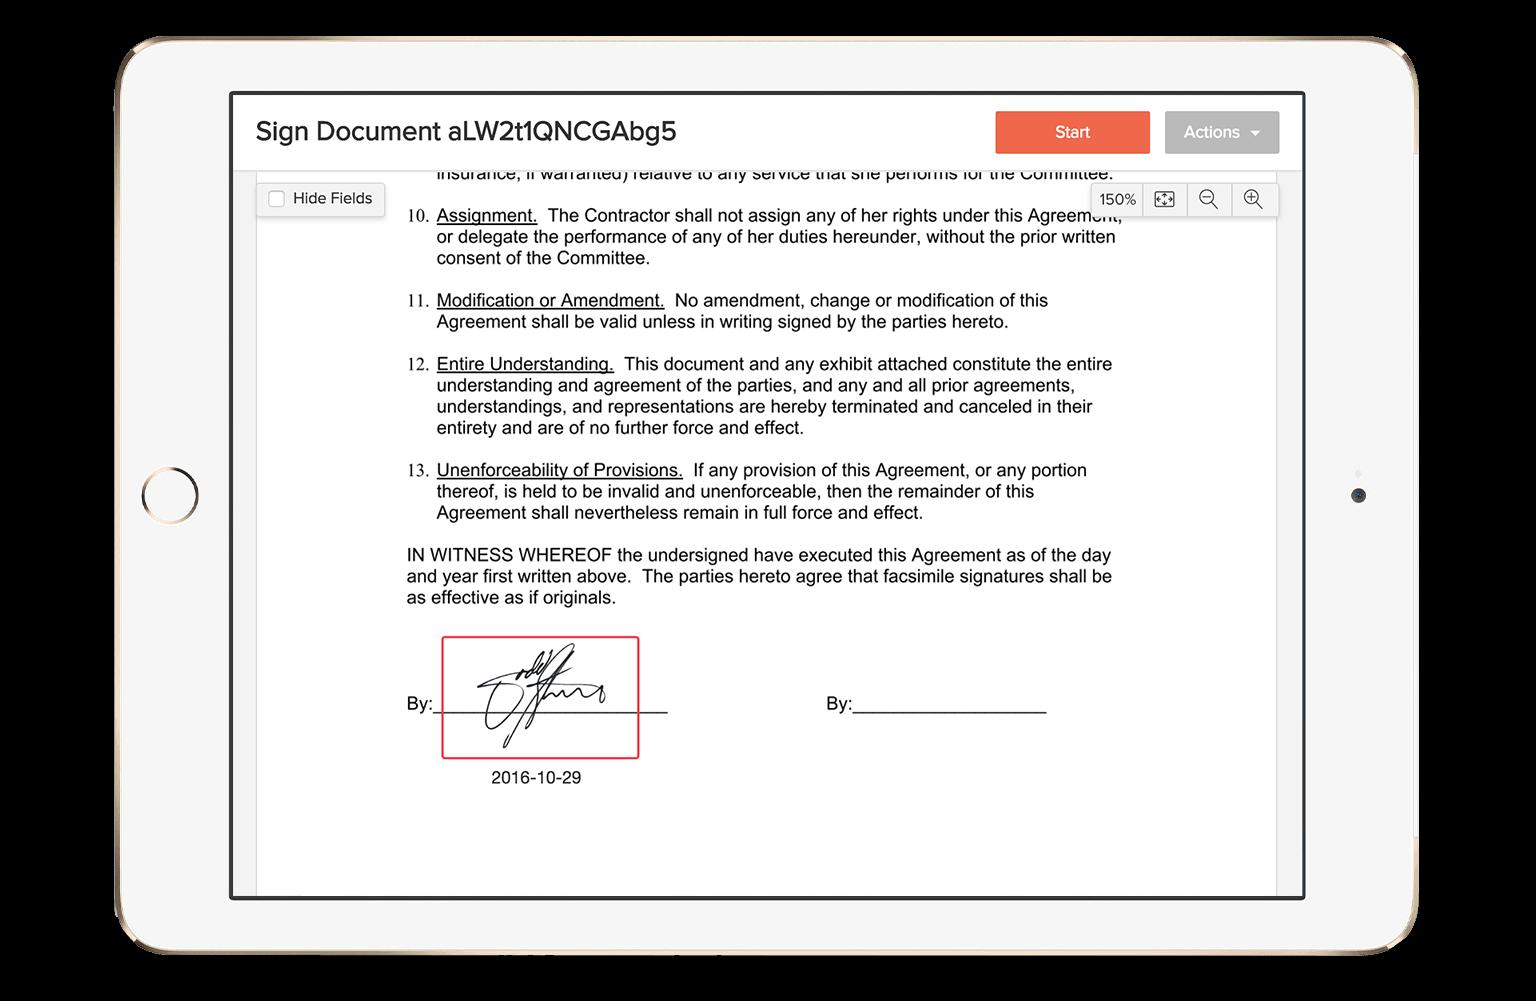 eversign Demo - eversign mobile